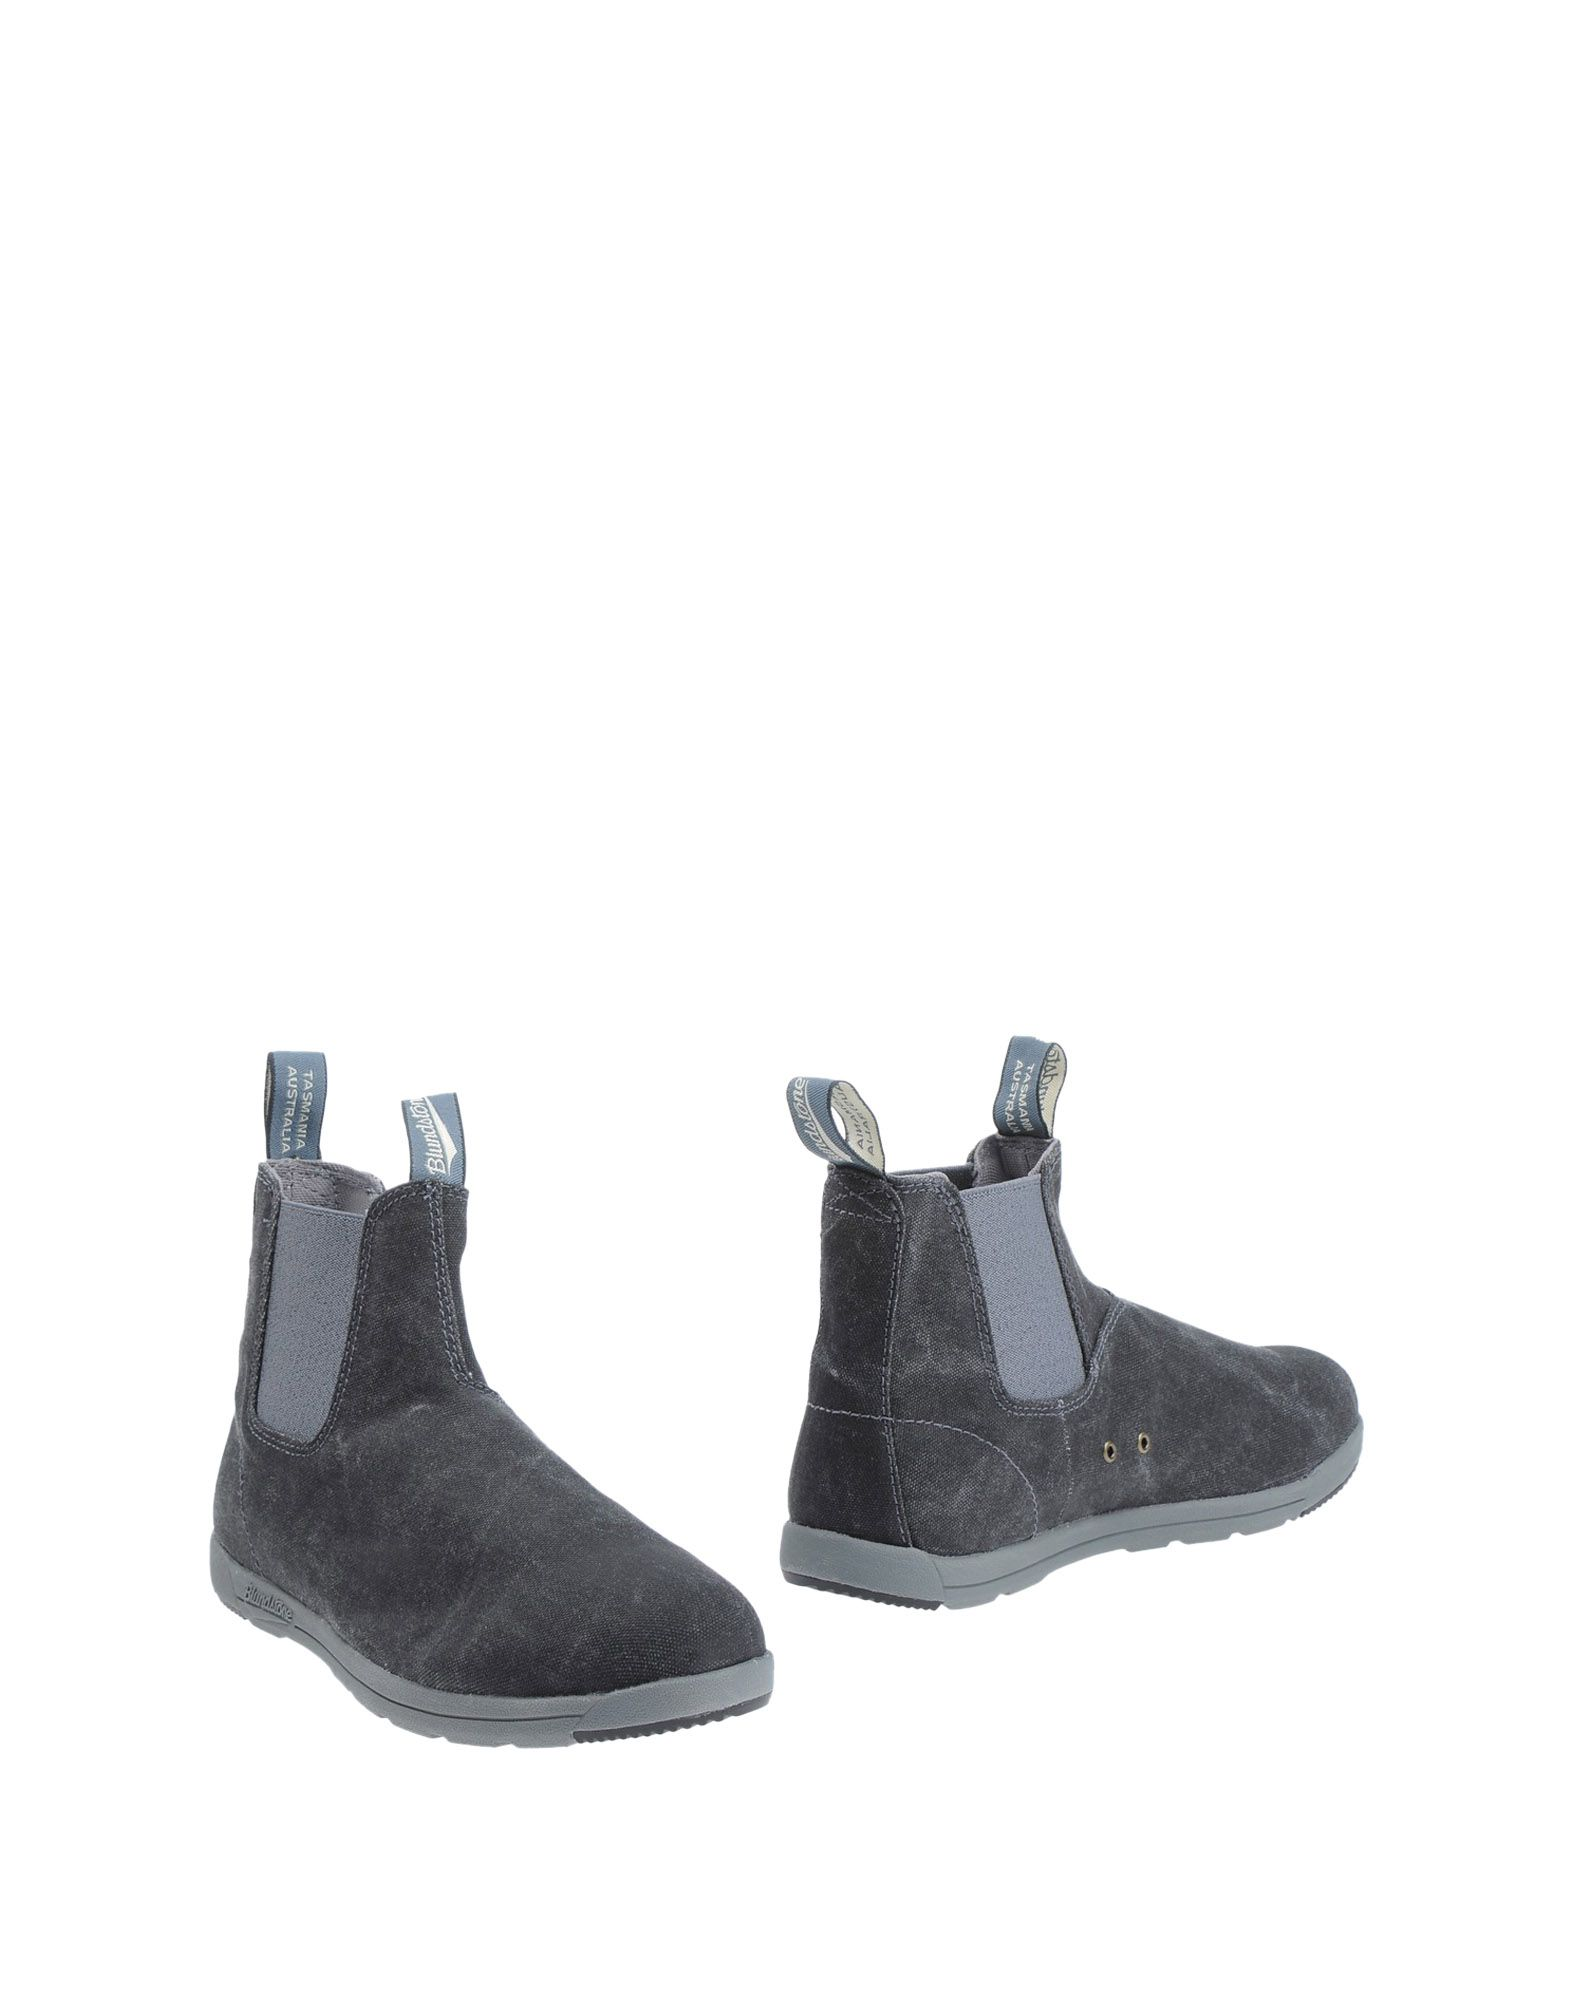 BLUNDSTONE Полусапоги и высокие ботинки george j love полусапоги и высокие ботинки